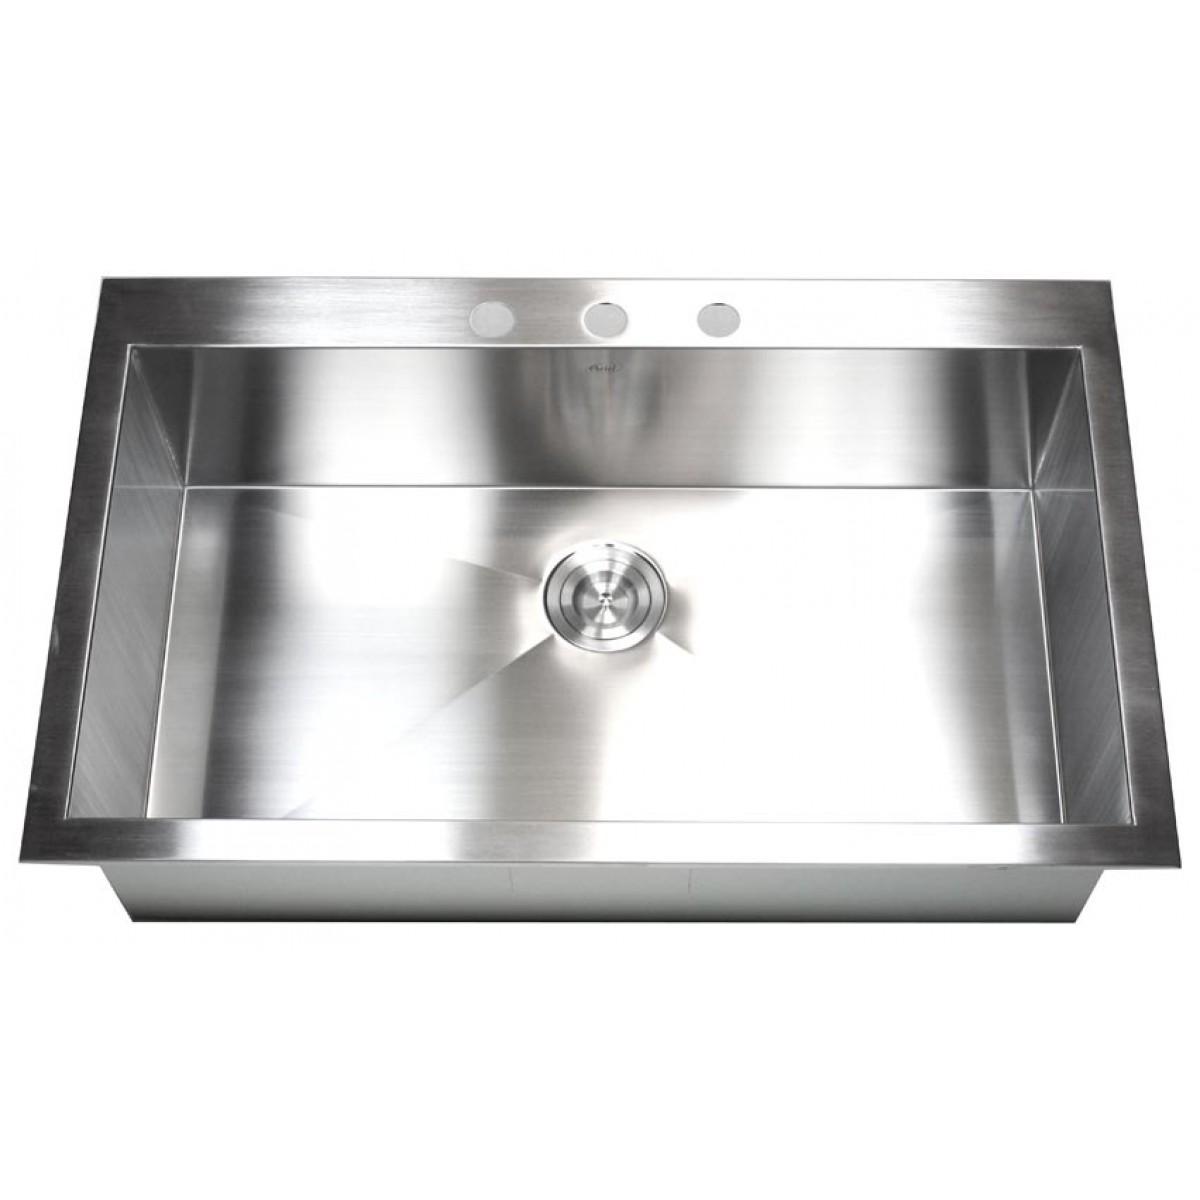 stainless steel single bowl kitchen sink target storage 36 inch top mount drop in super